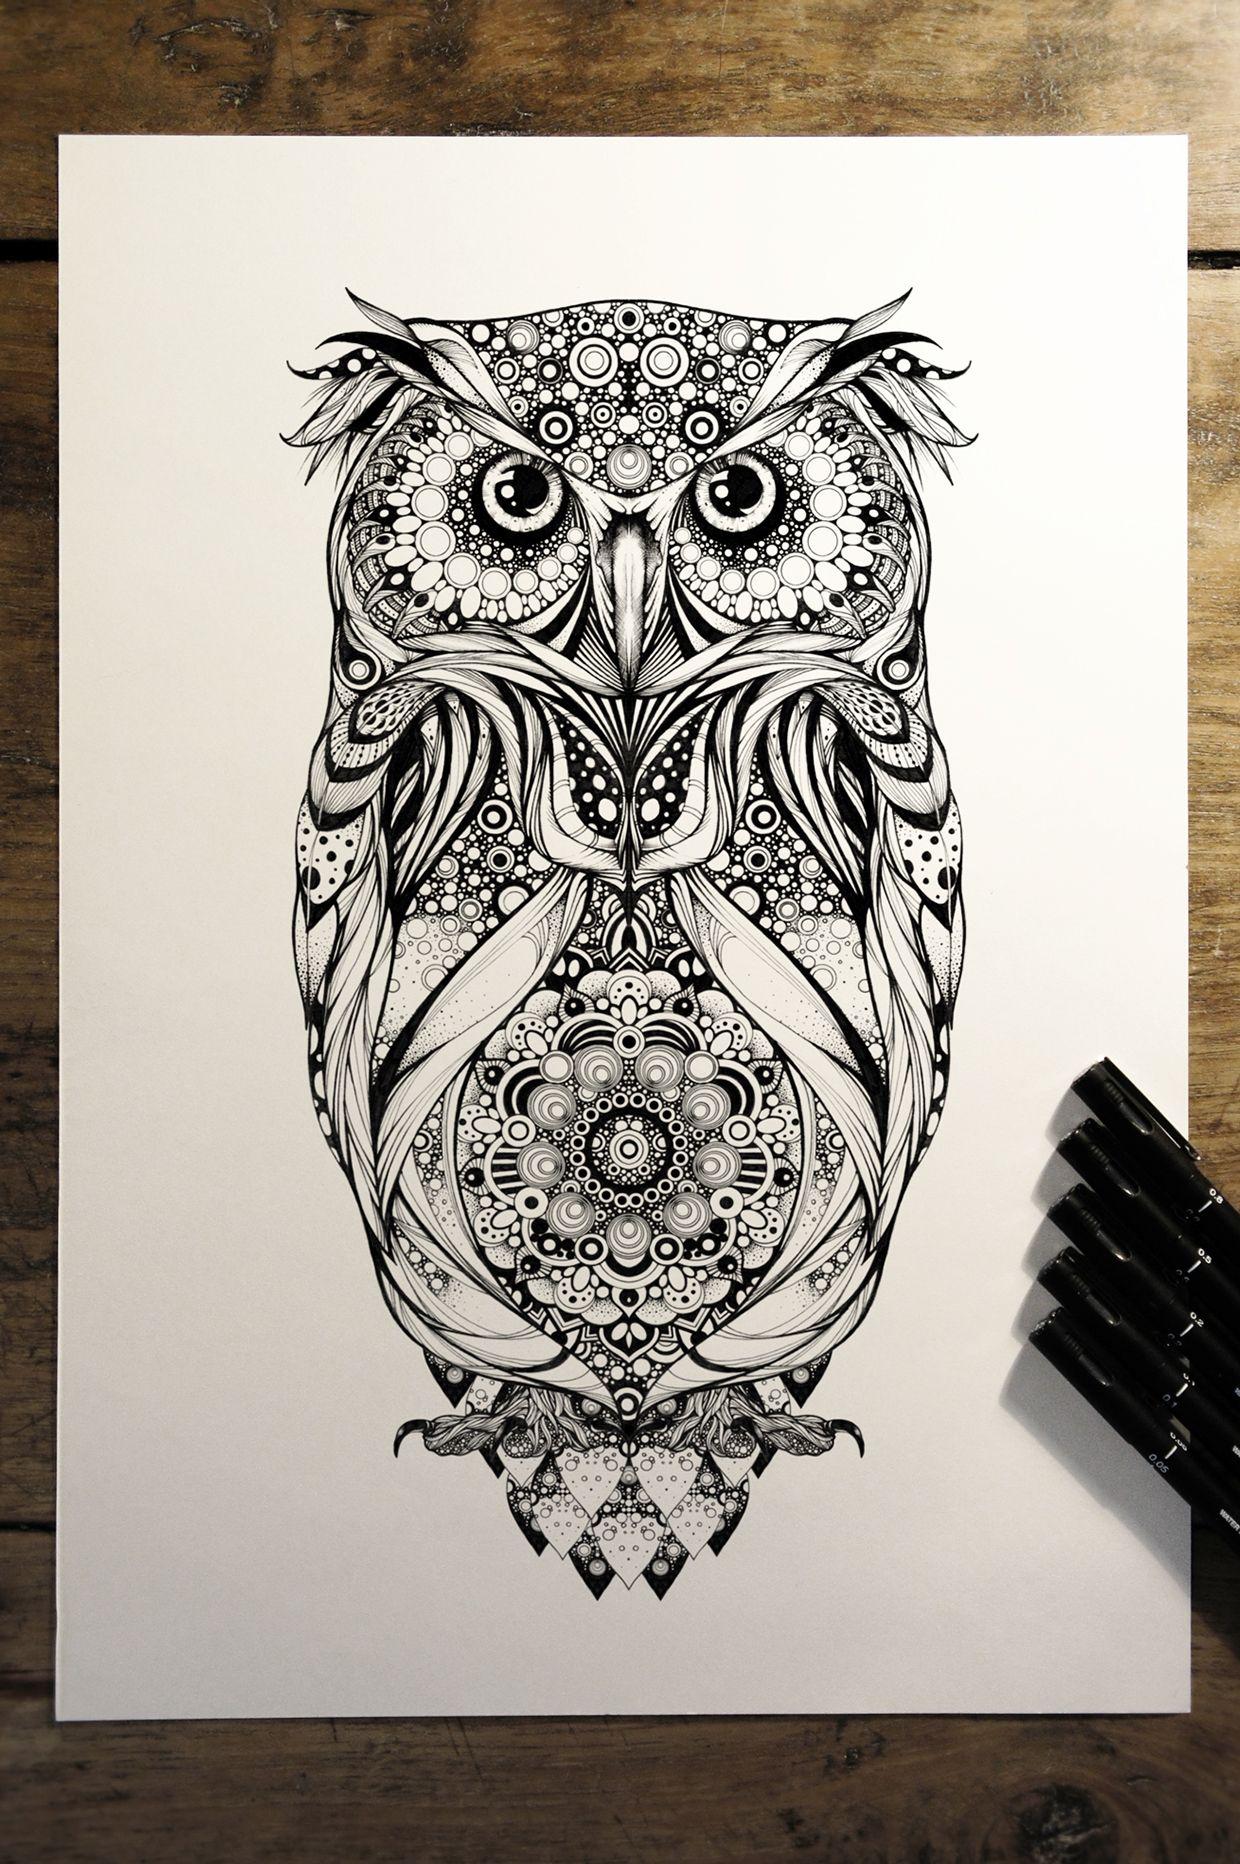 Buho Tatuaje Mandala spotted eagle owl' - commission for hoot watches on behance